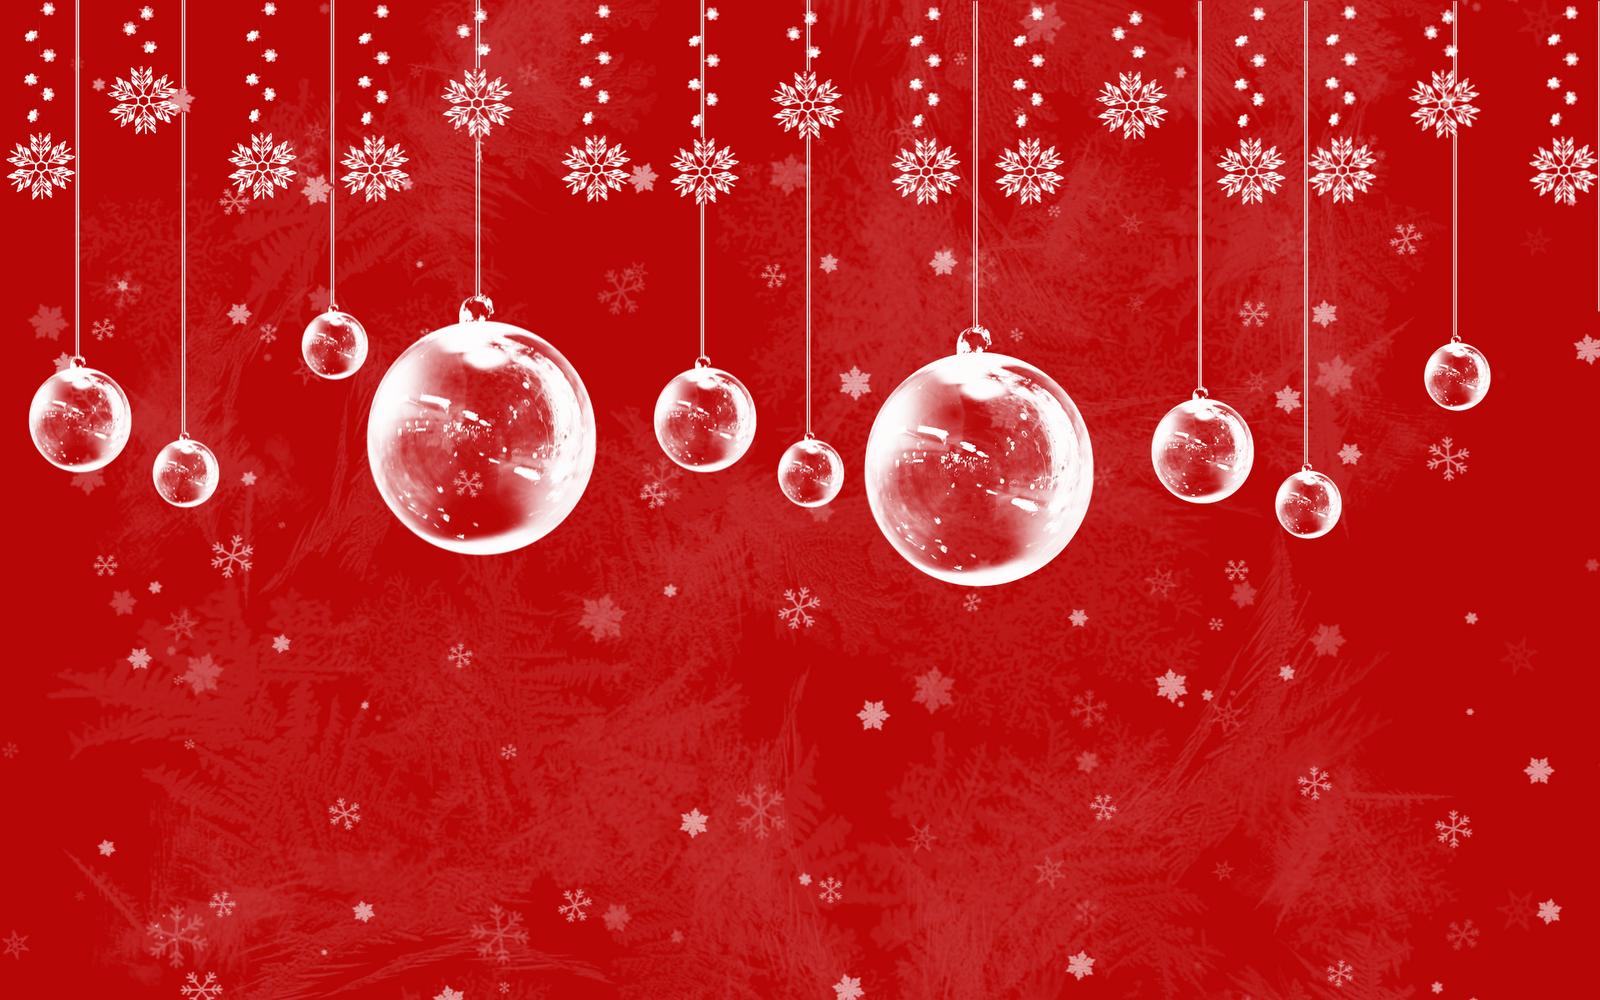 Happy New Year HD Desktop Wallpaper Widescreen High